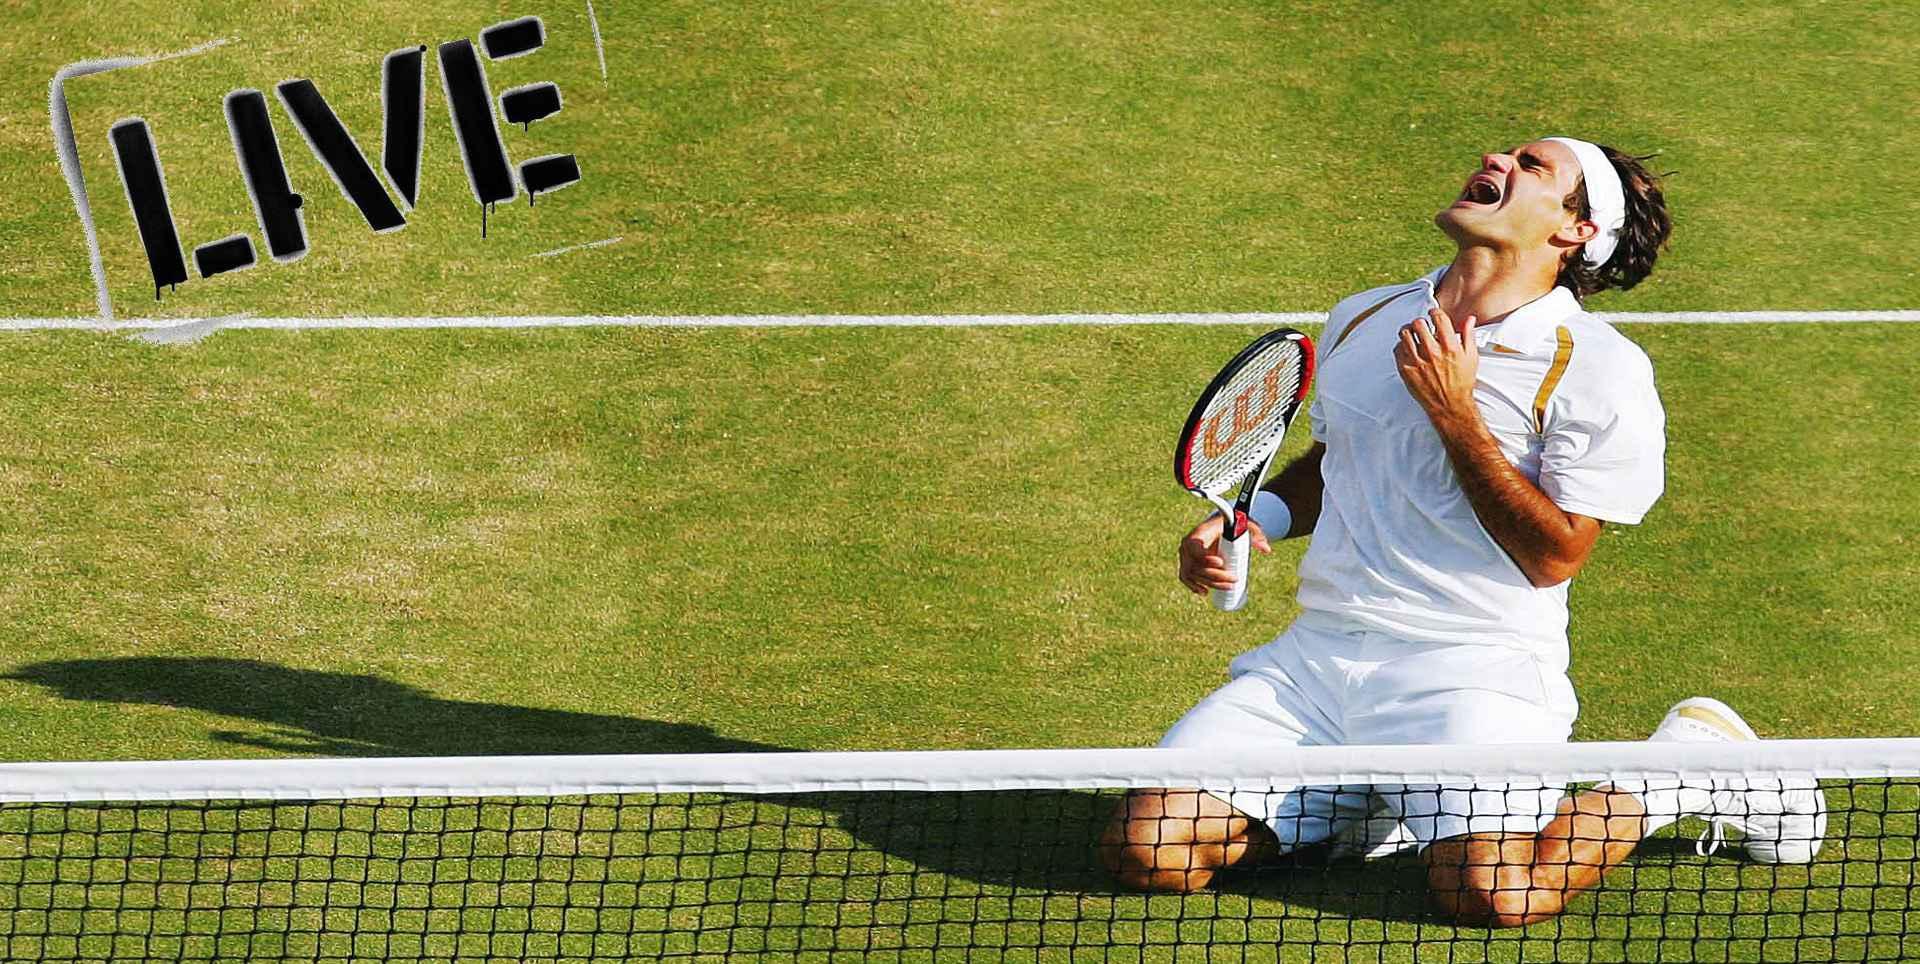 2017 Wimbledon Mens Singles Round 1 Live